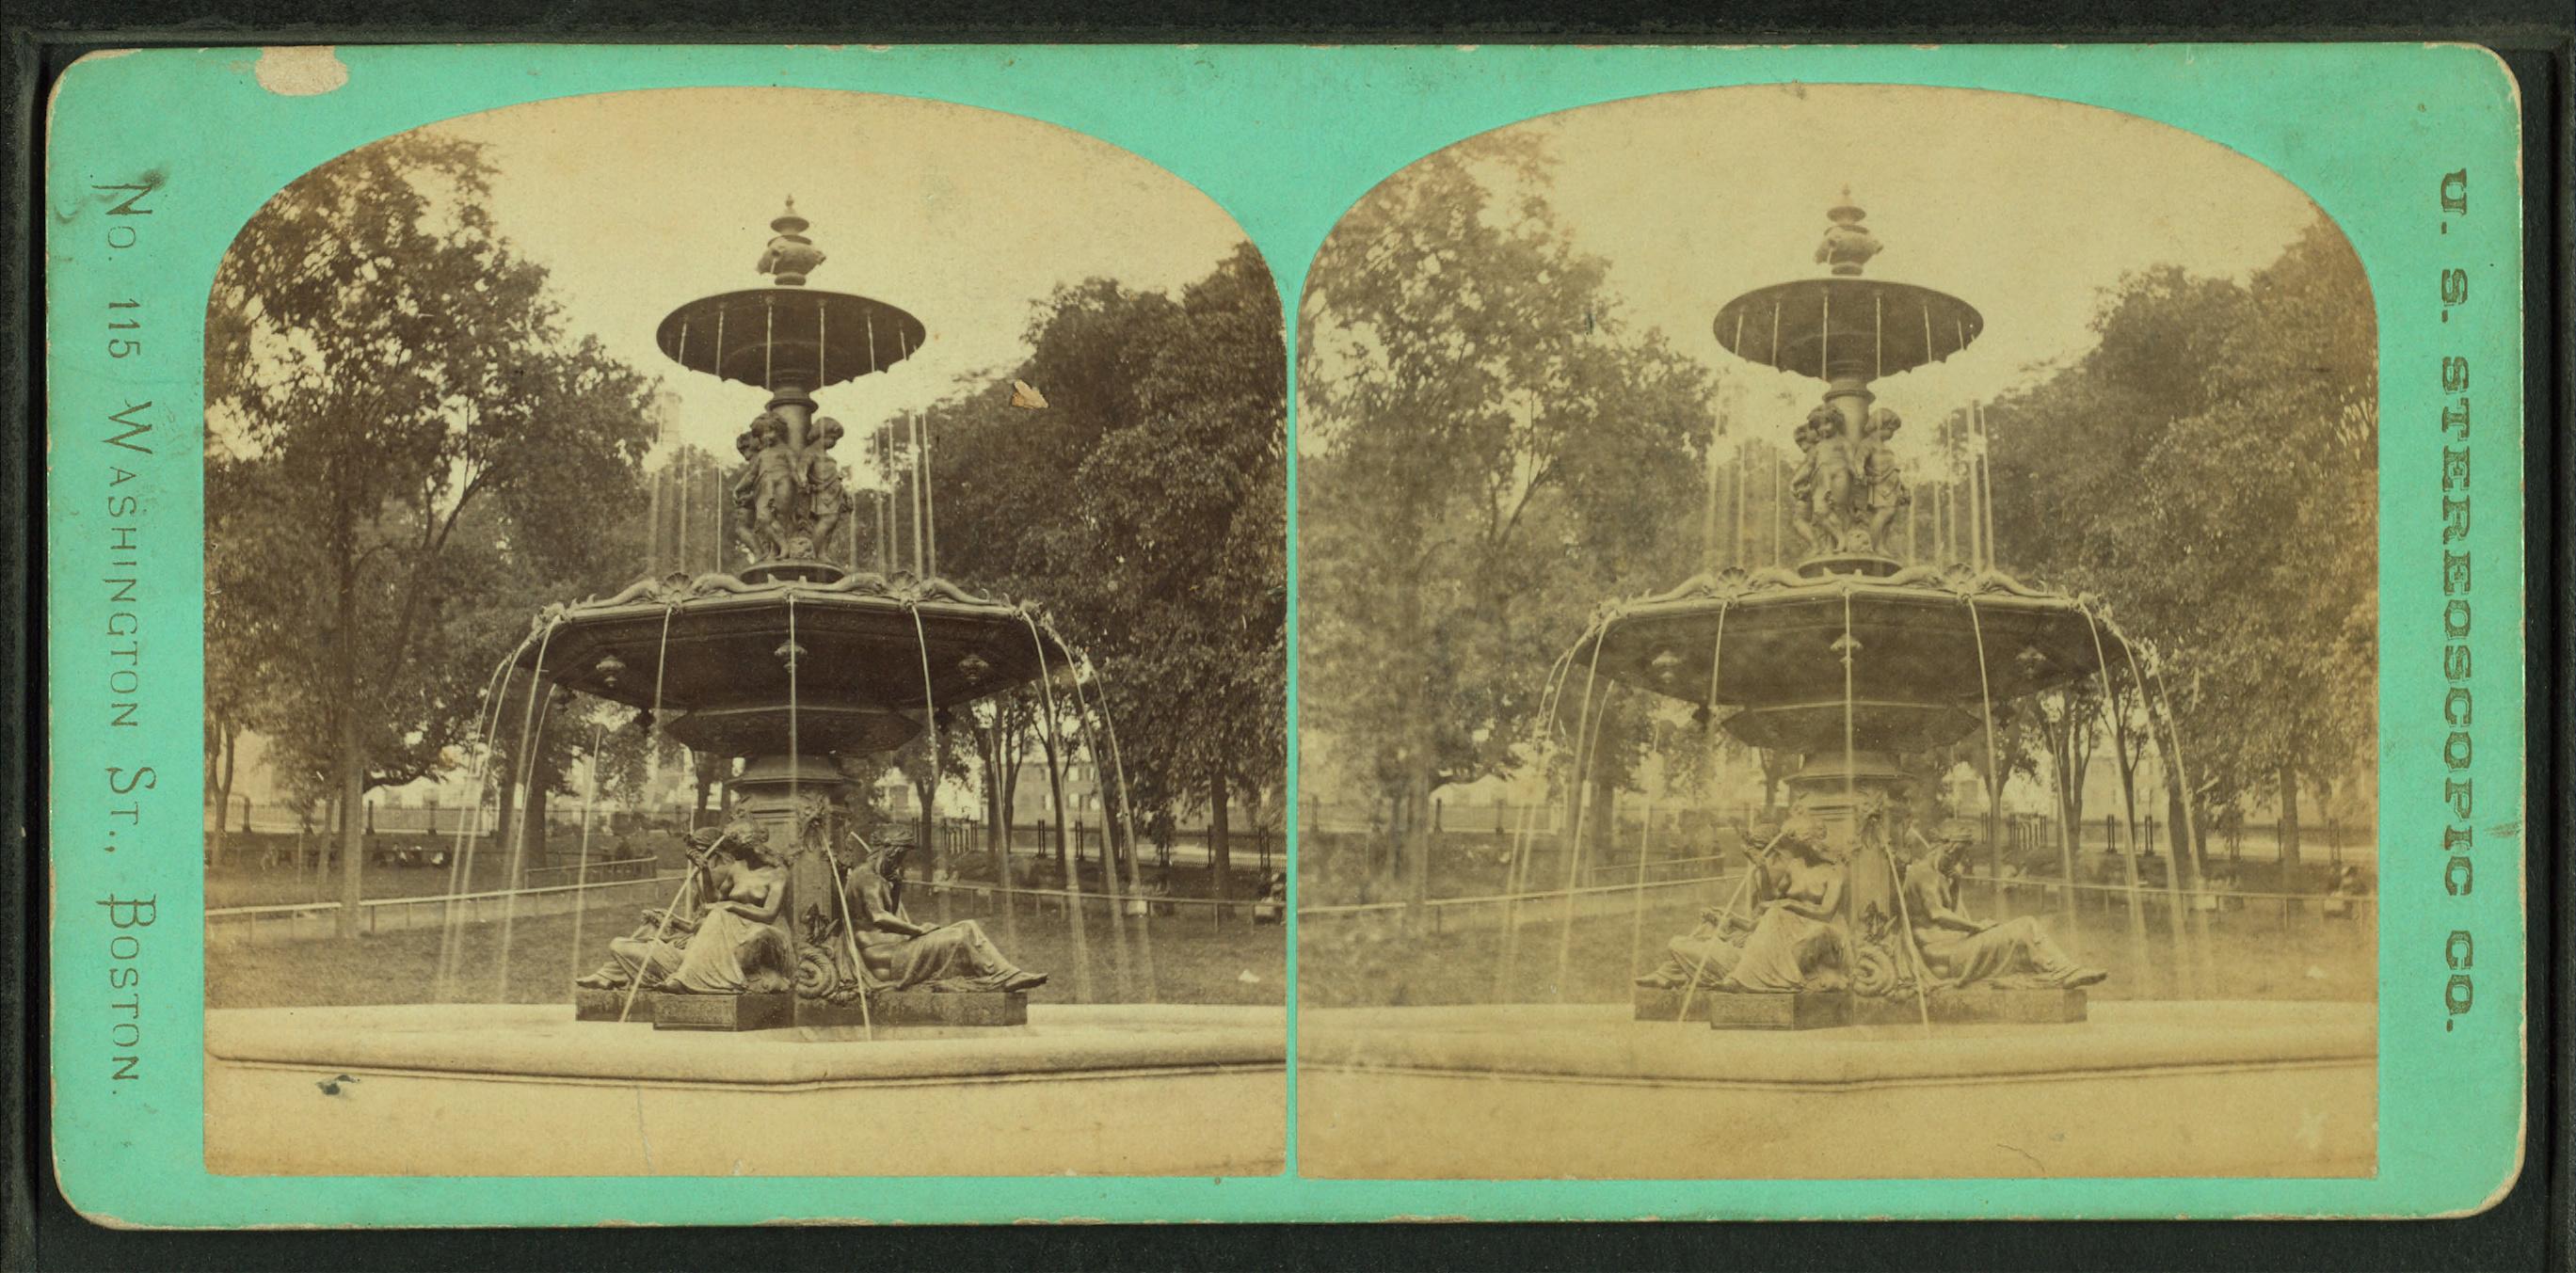 By U.S. Stereoscopic Co.--Publisher [Public domain], via Wikimedia Commons